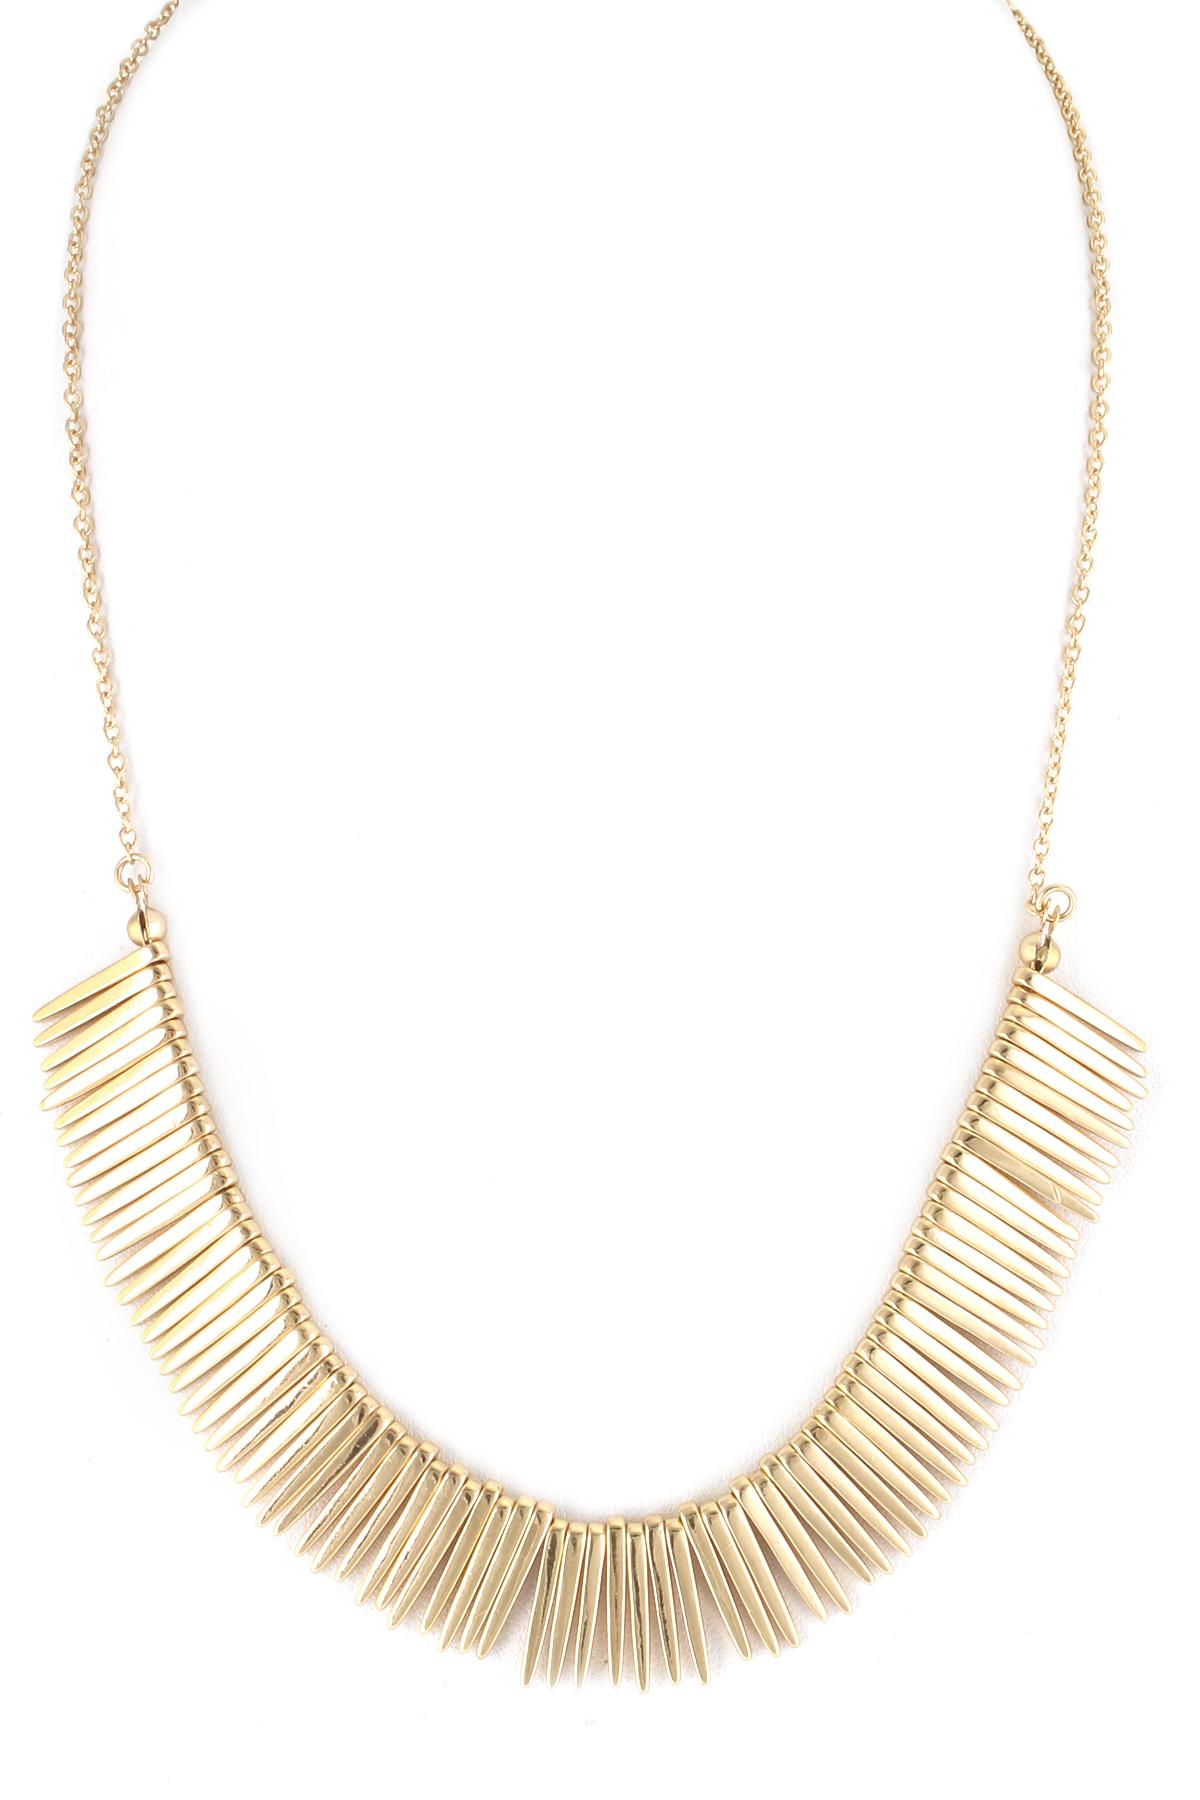 Metal Fringe Necklace - Necklaces